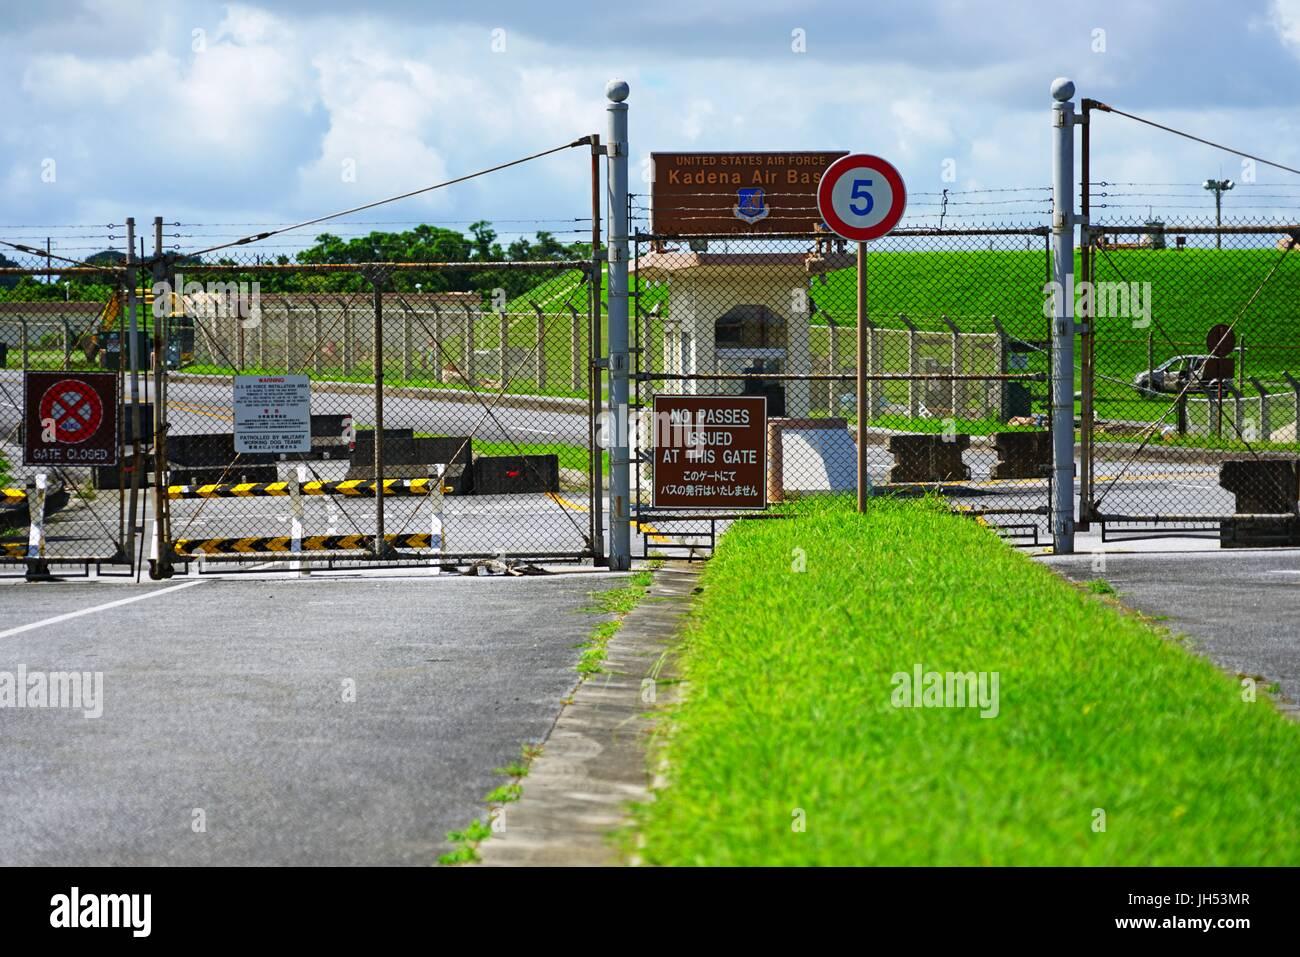 Entrance Of The Kadena Air Base A United States Air Force Base In - United states air force bases